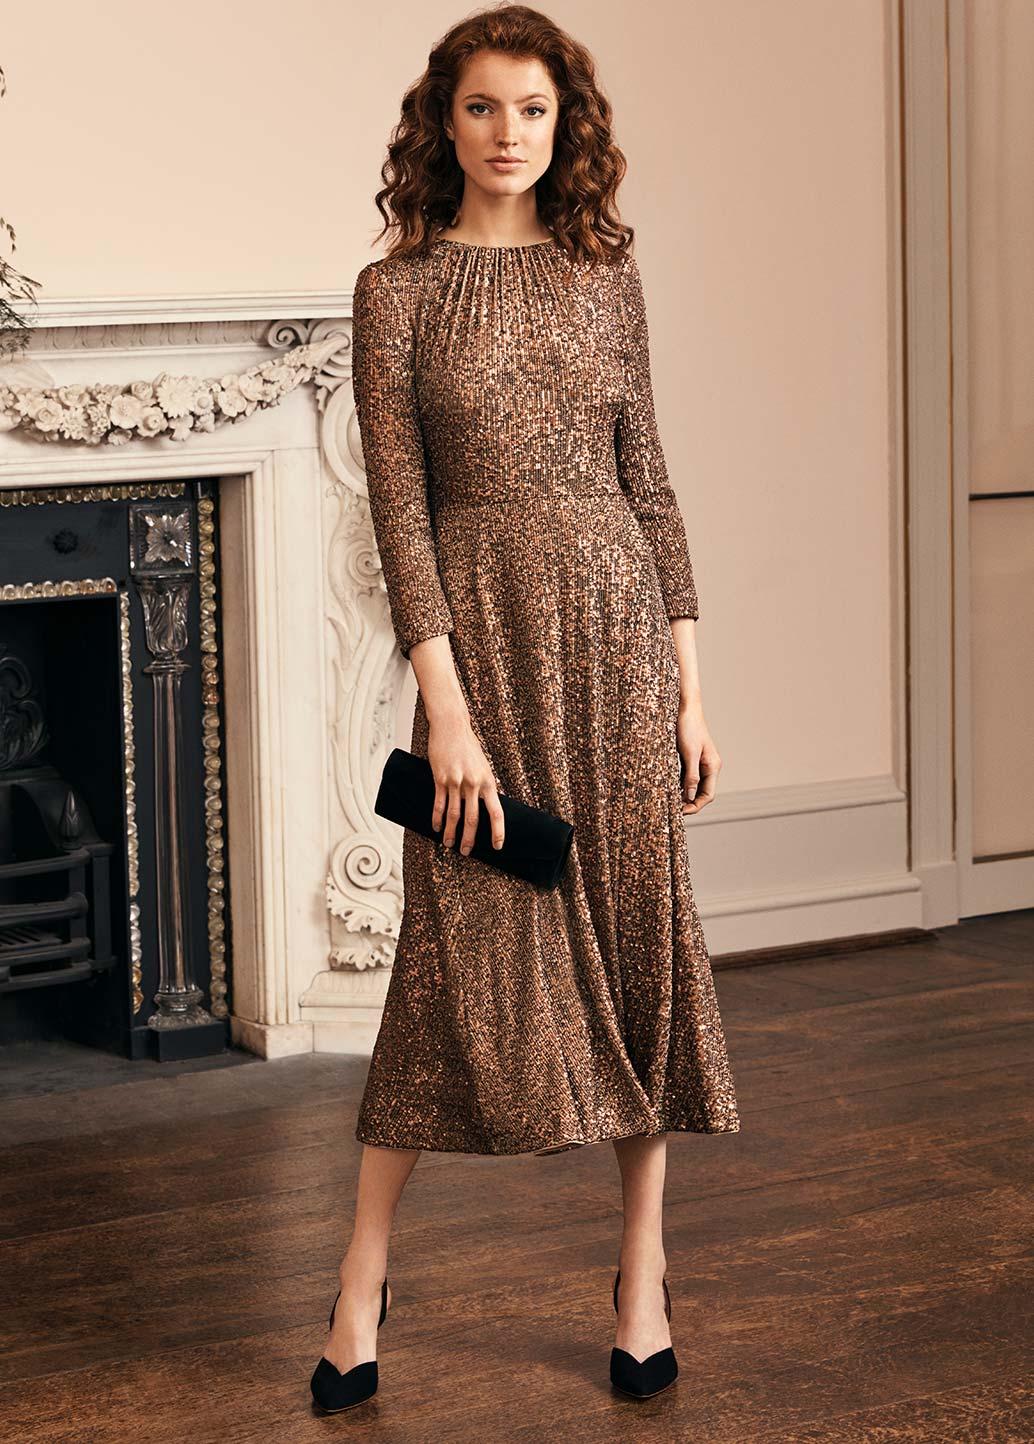 Hobbs London Women's Fashion, Autumn Winter 2019